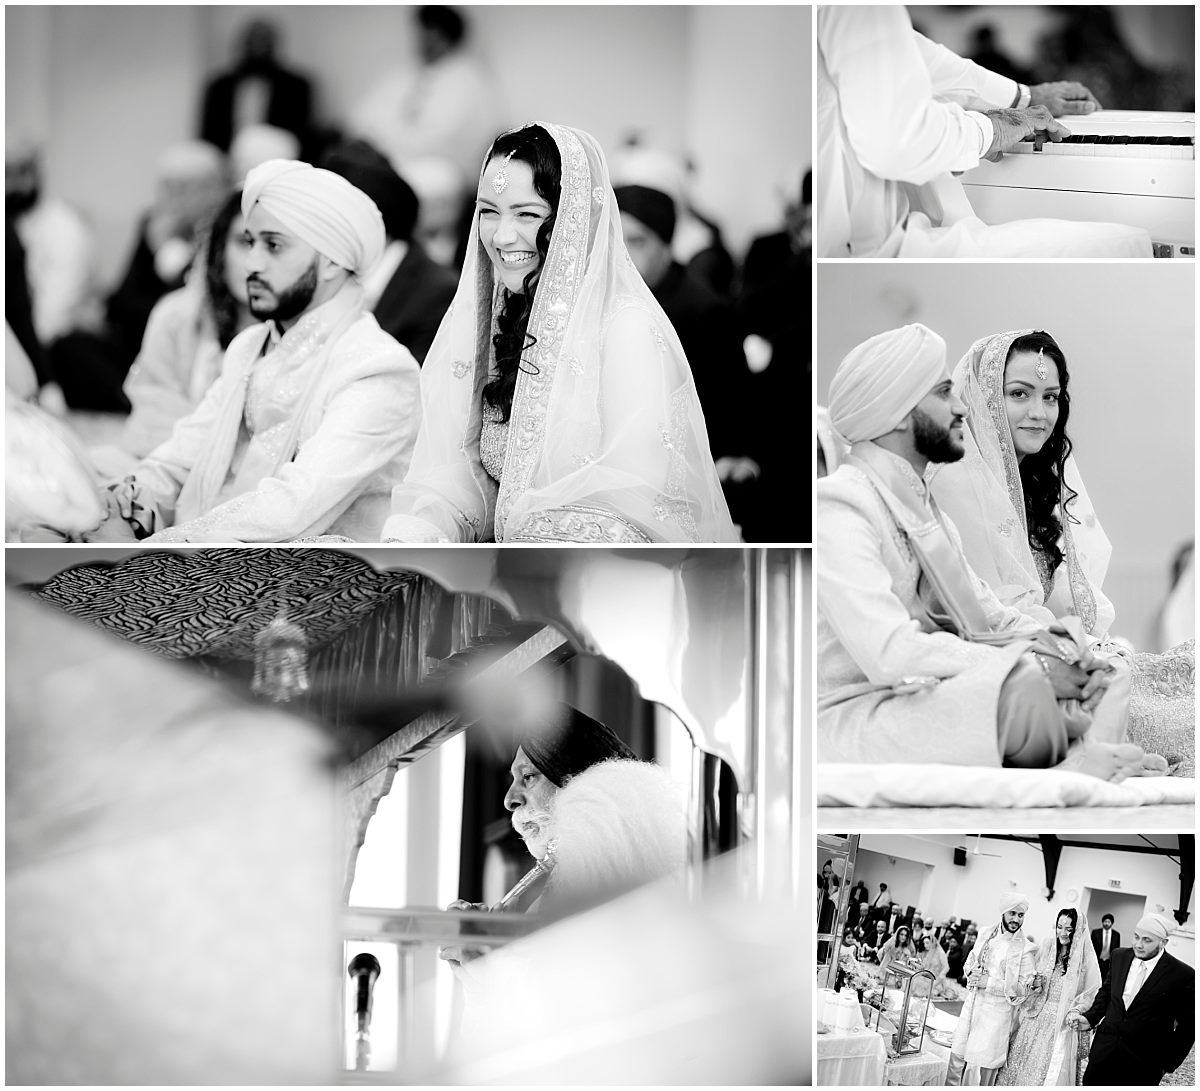 Sikh Wedding Ceremony in black and white